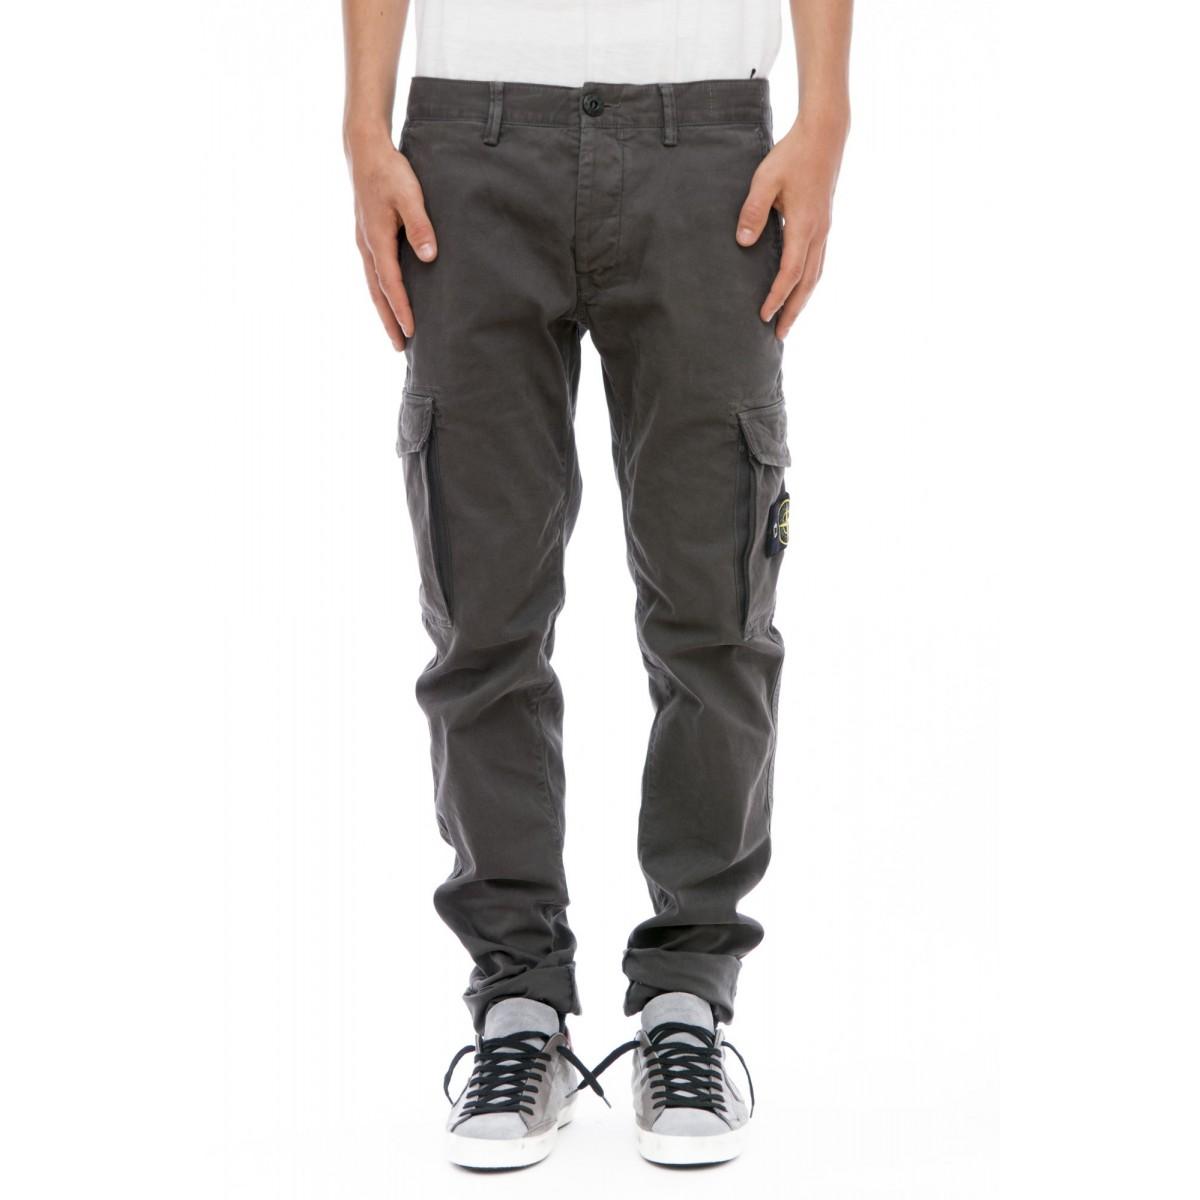 Pantalone uomo Stone island - 3s2wn pantalone tasconato slim